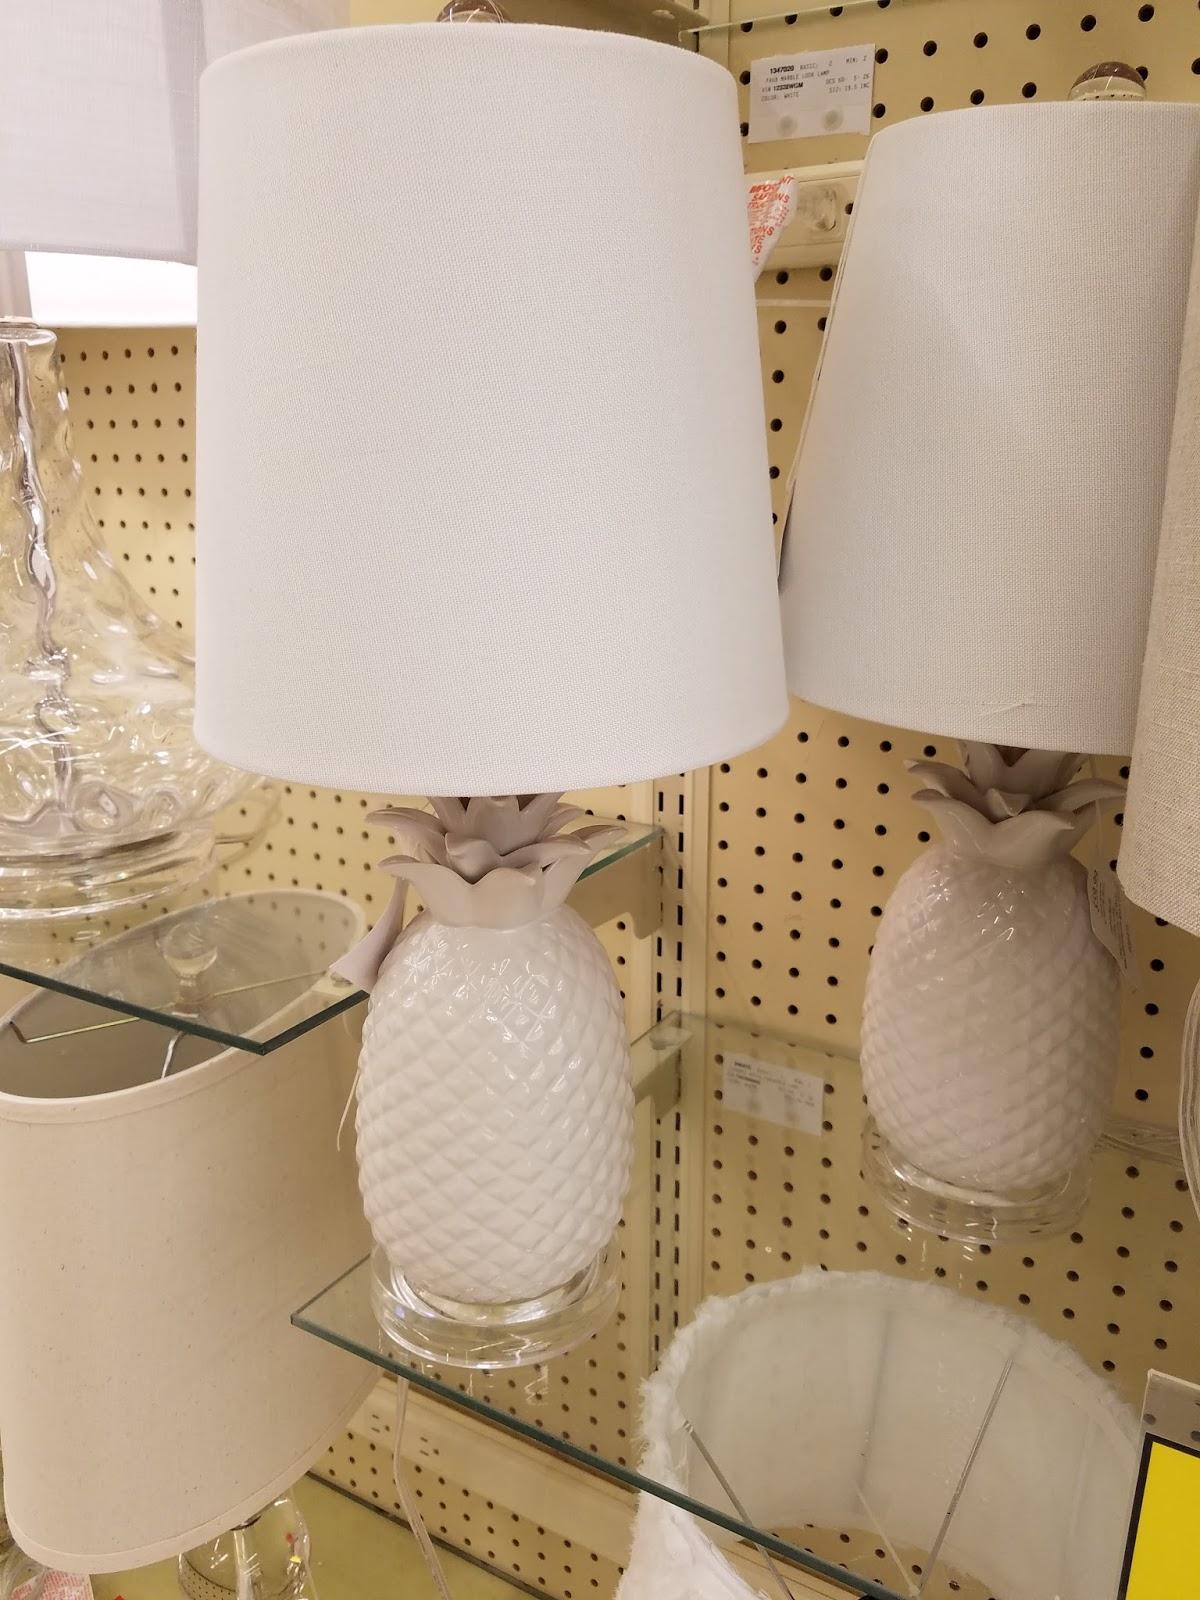 Next Is The White Ceramic Pineapple Lamp. My Favorite!